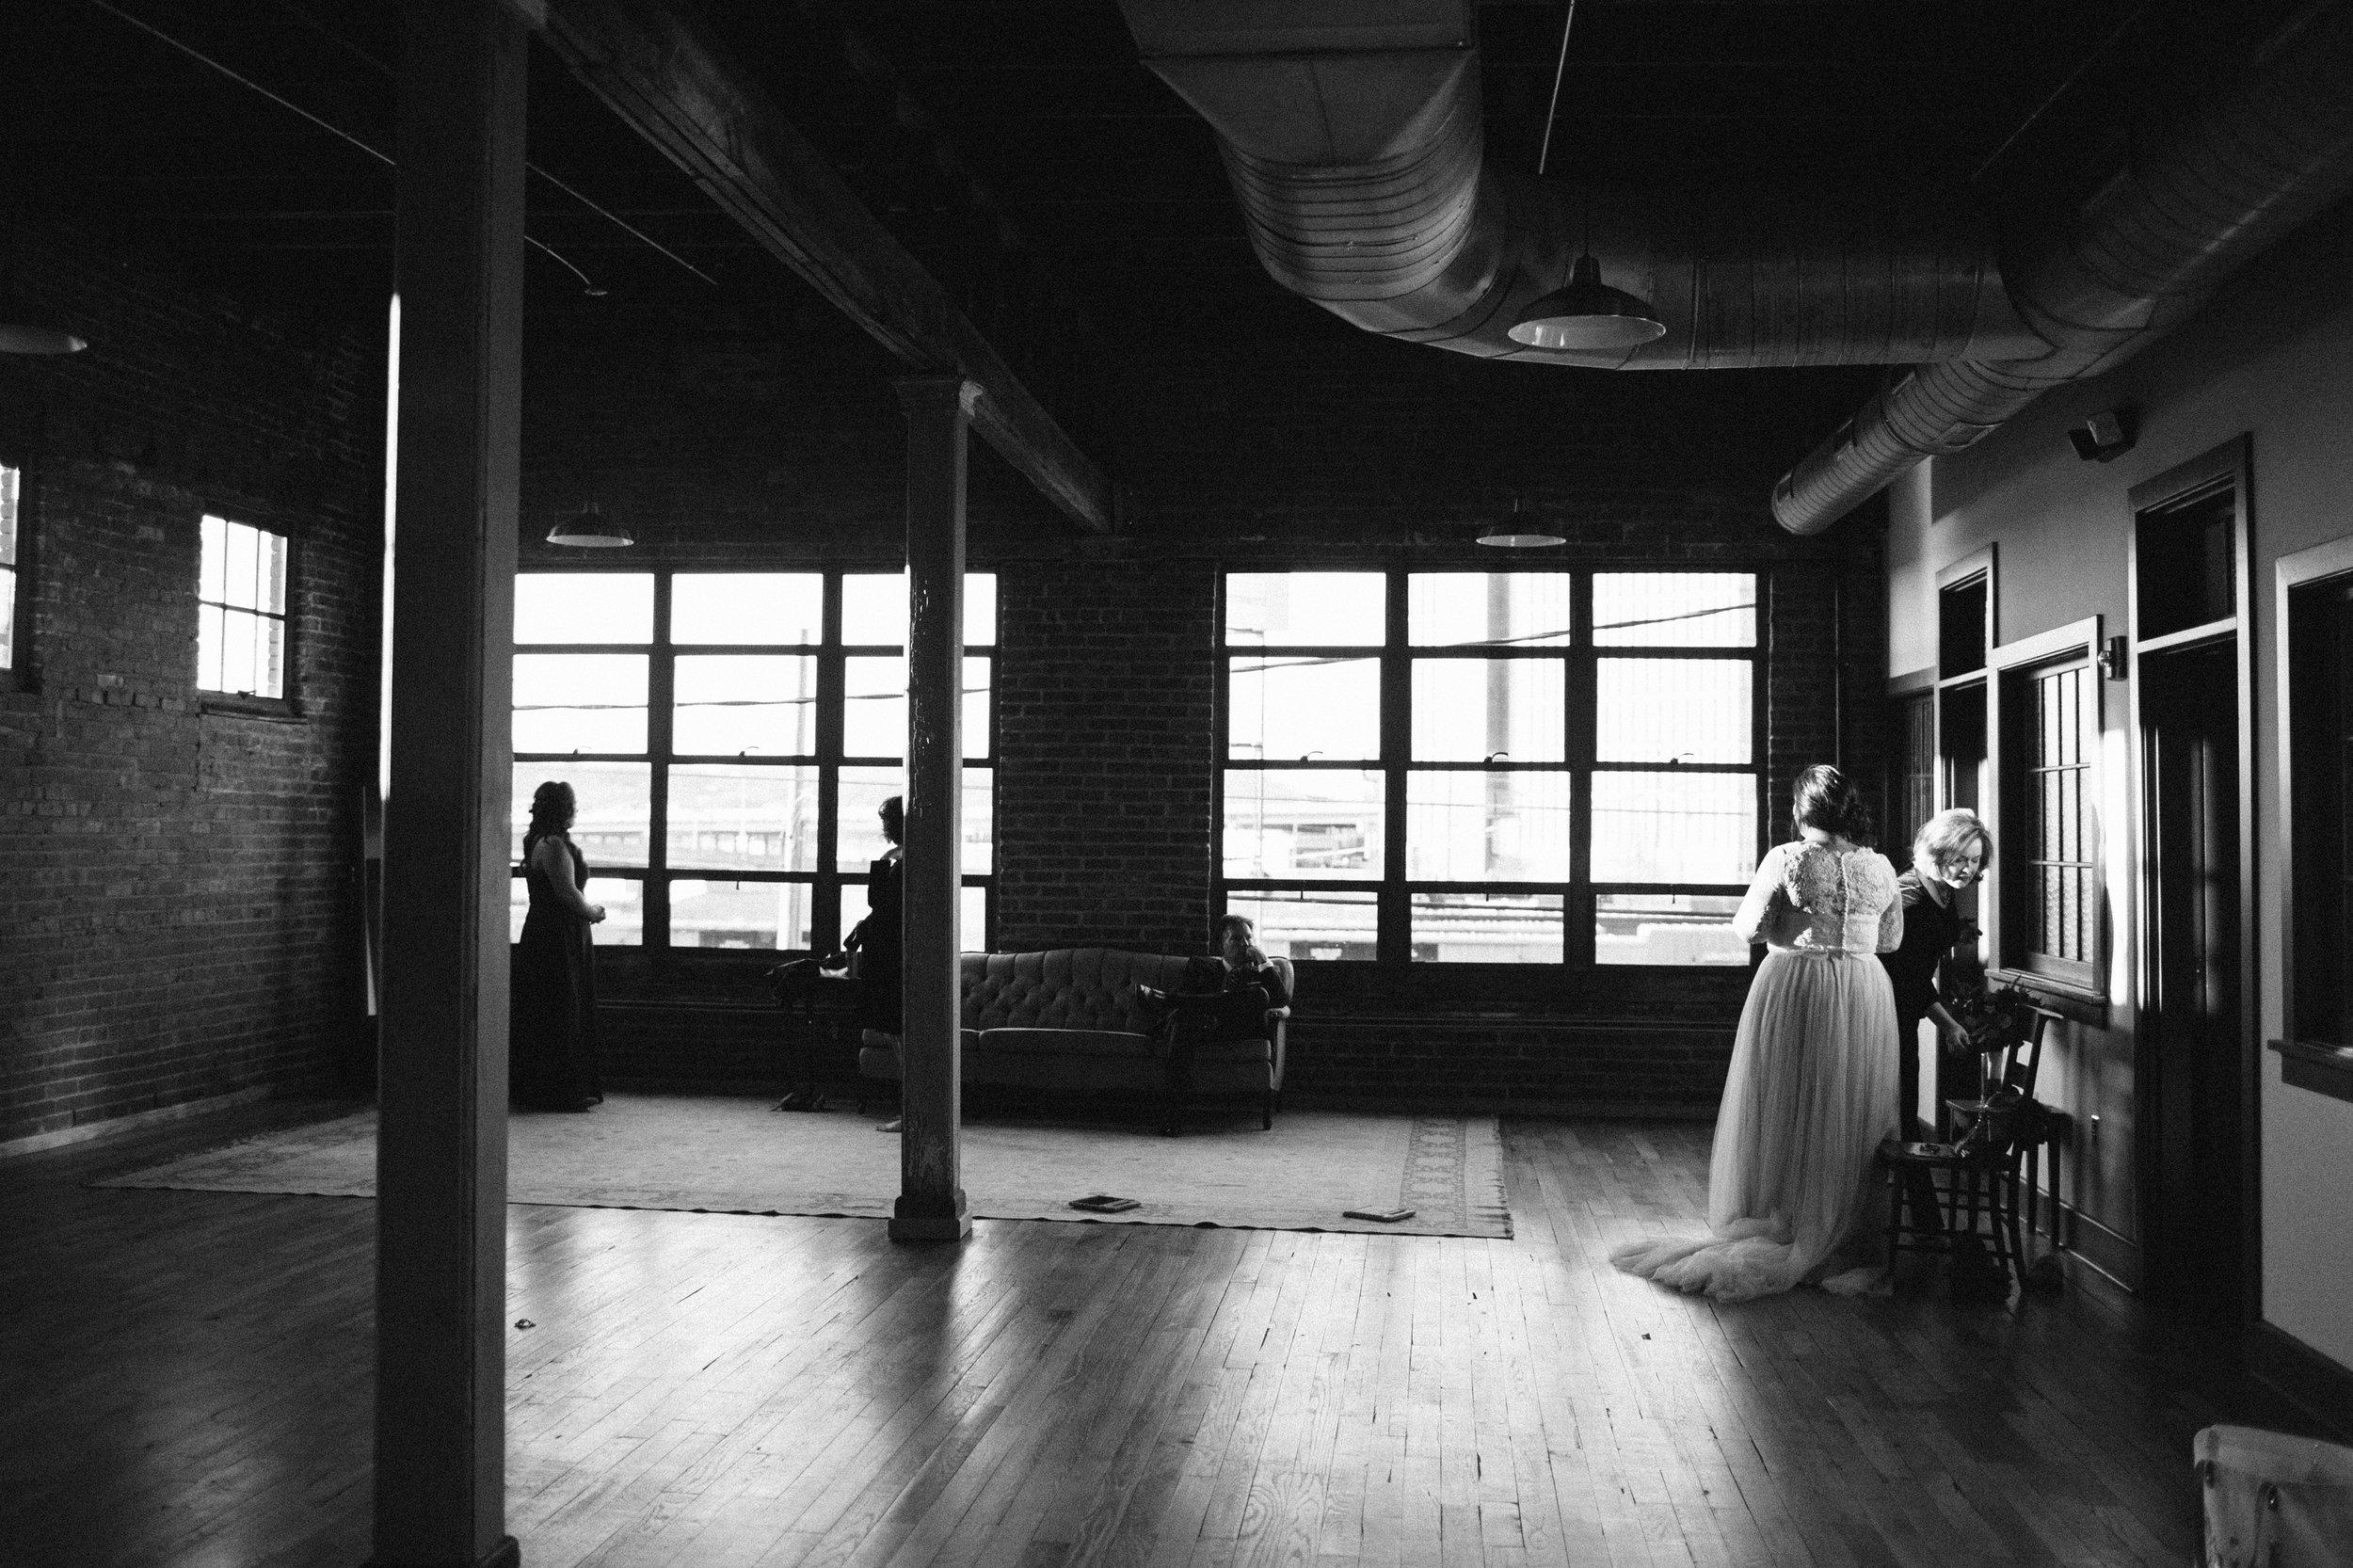 Lauren_Jeremy_Standard_Wedding_Knoxville_Abigail_Malone_Photography_FIlm-440.jpg